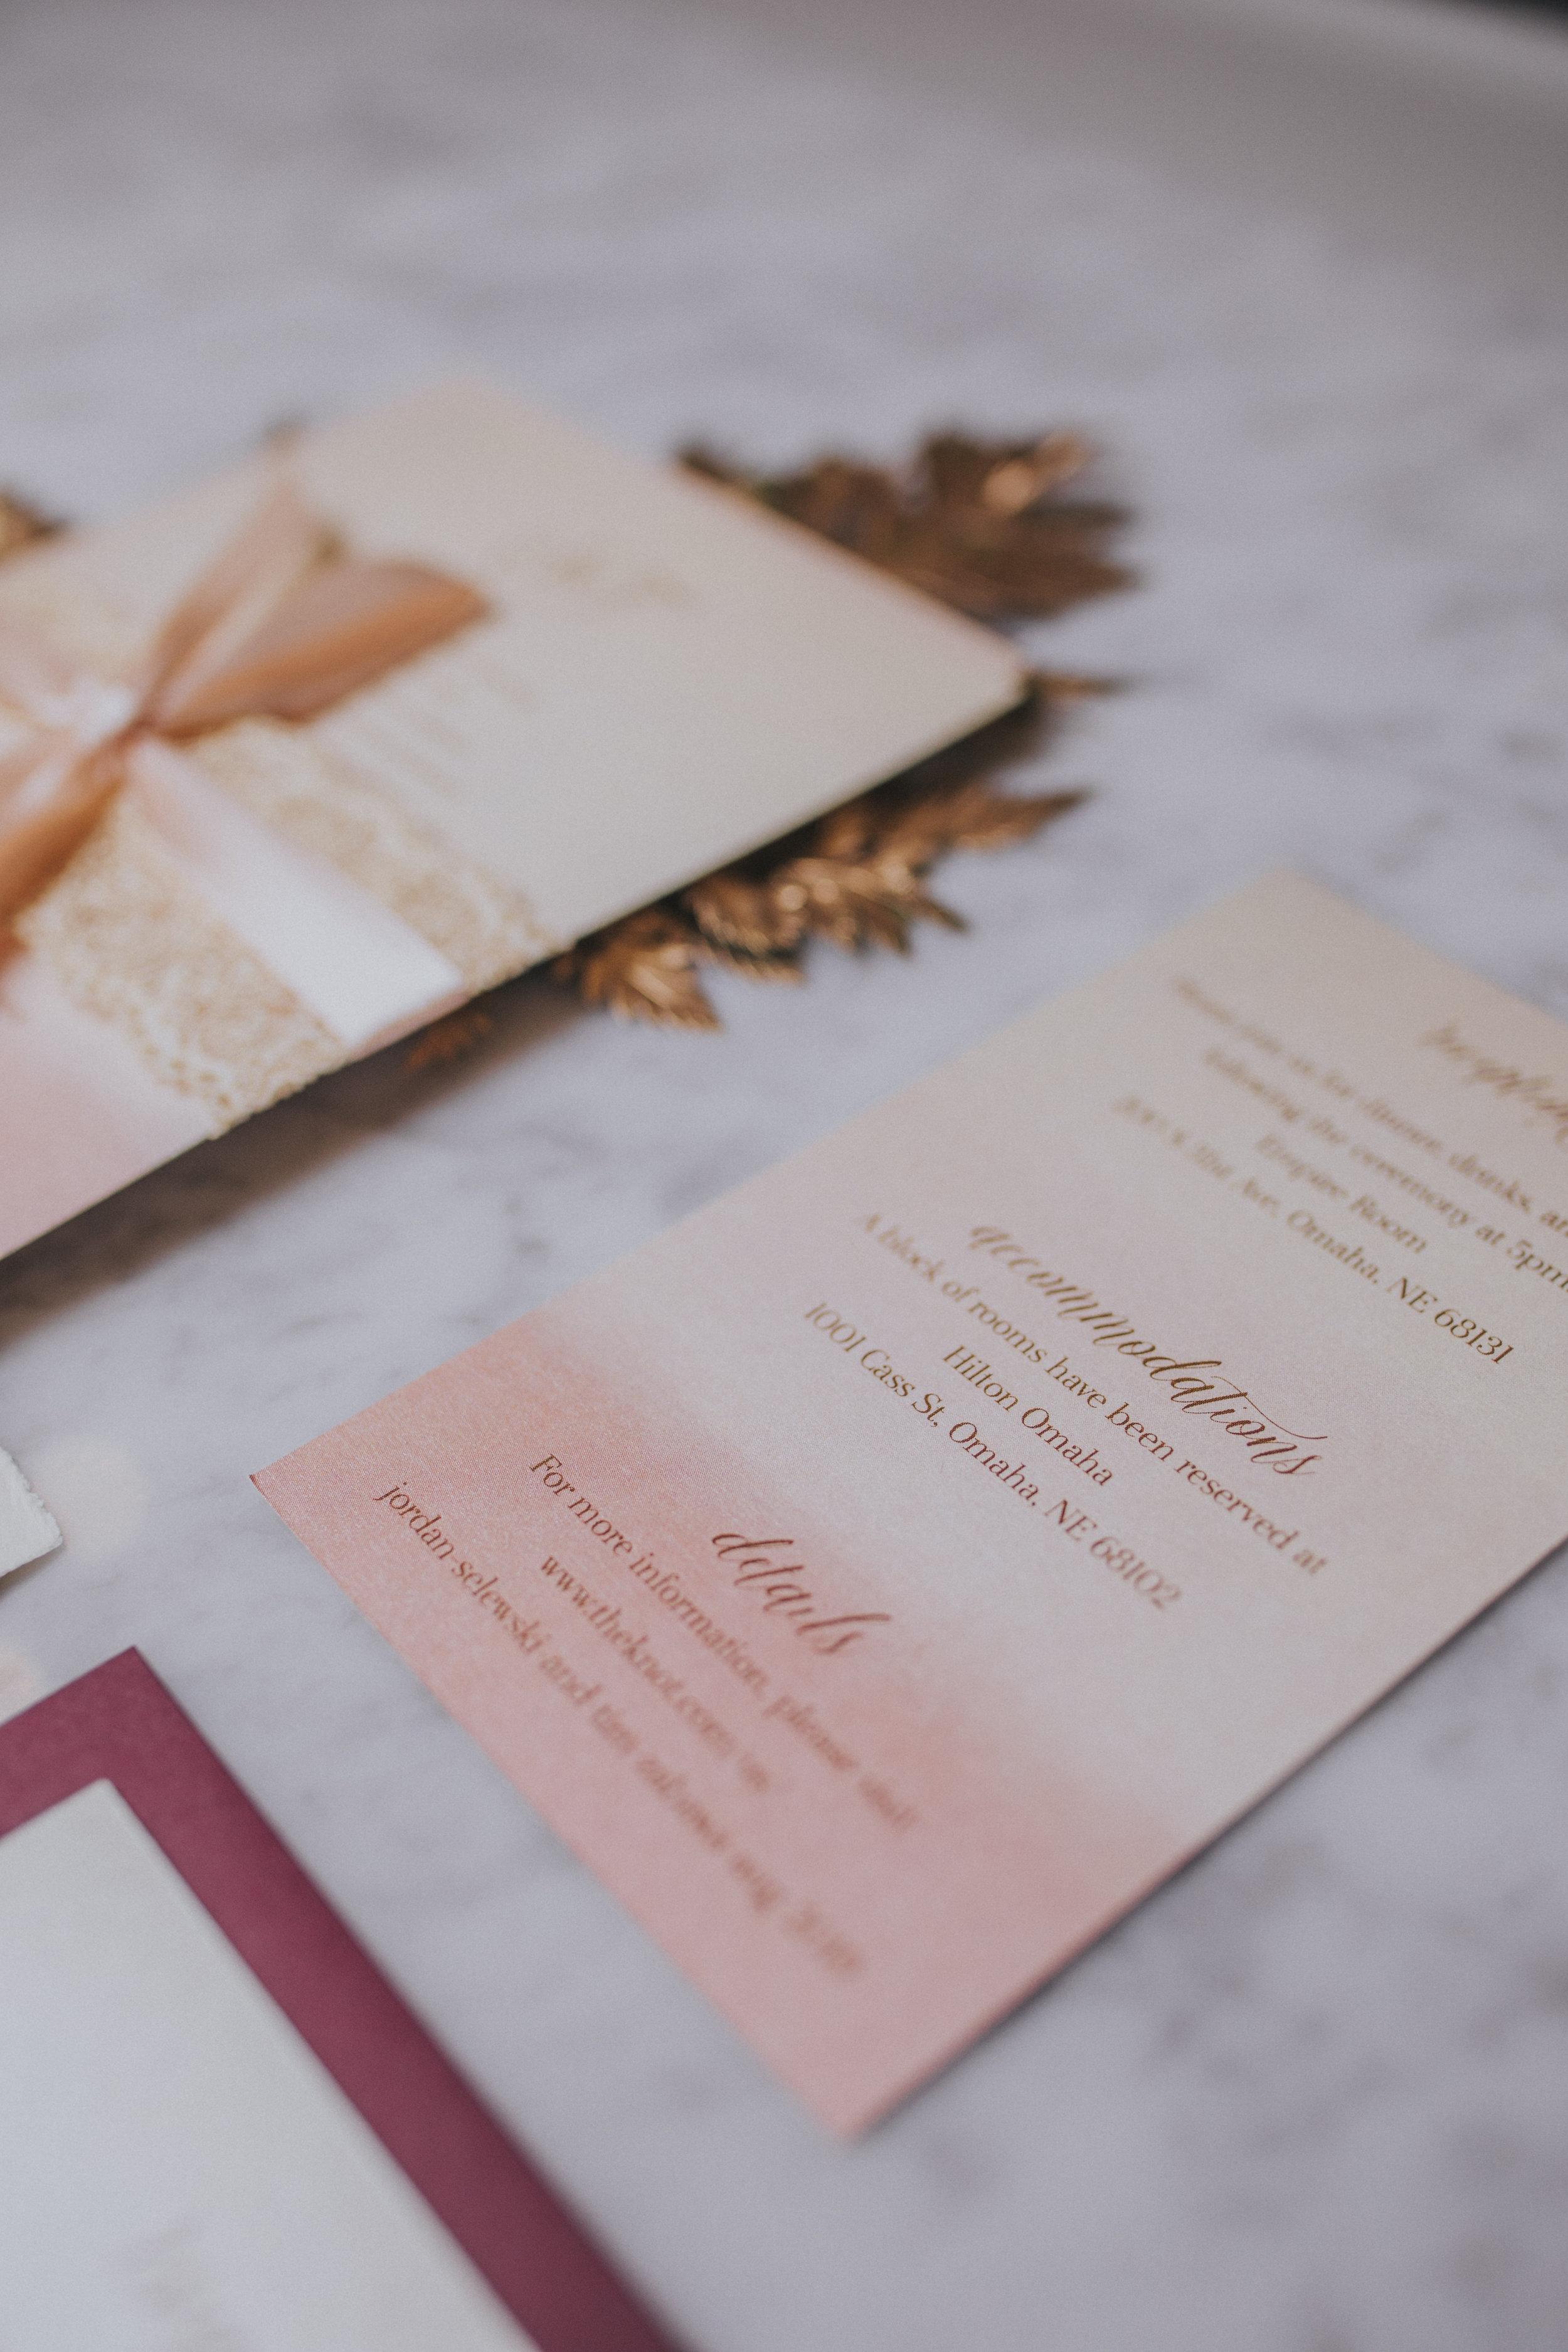 27  omaha-nebraska-empire-room-tiny-luxe-wedding-planner.jpg